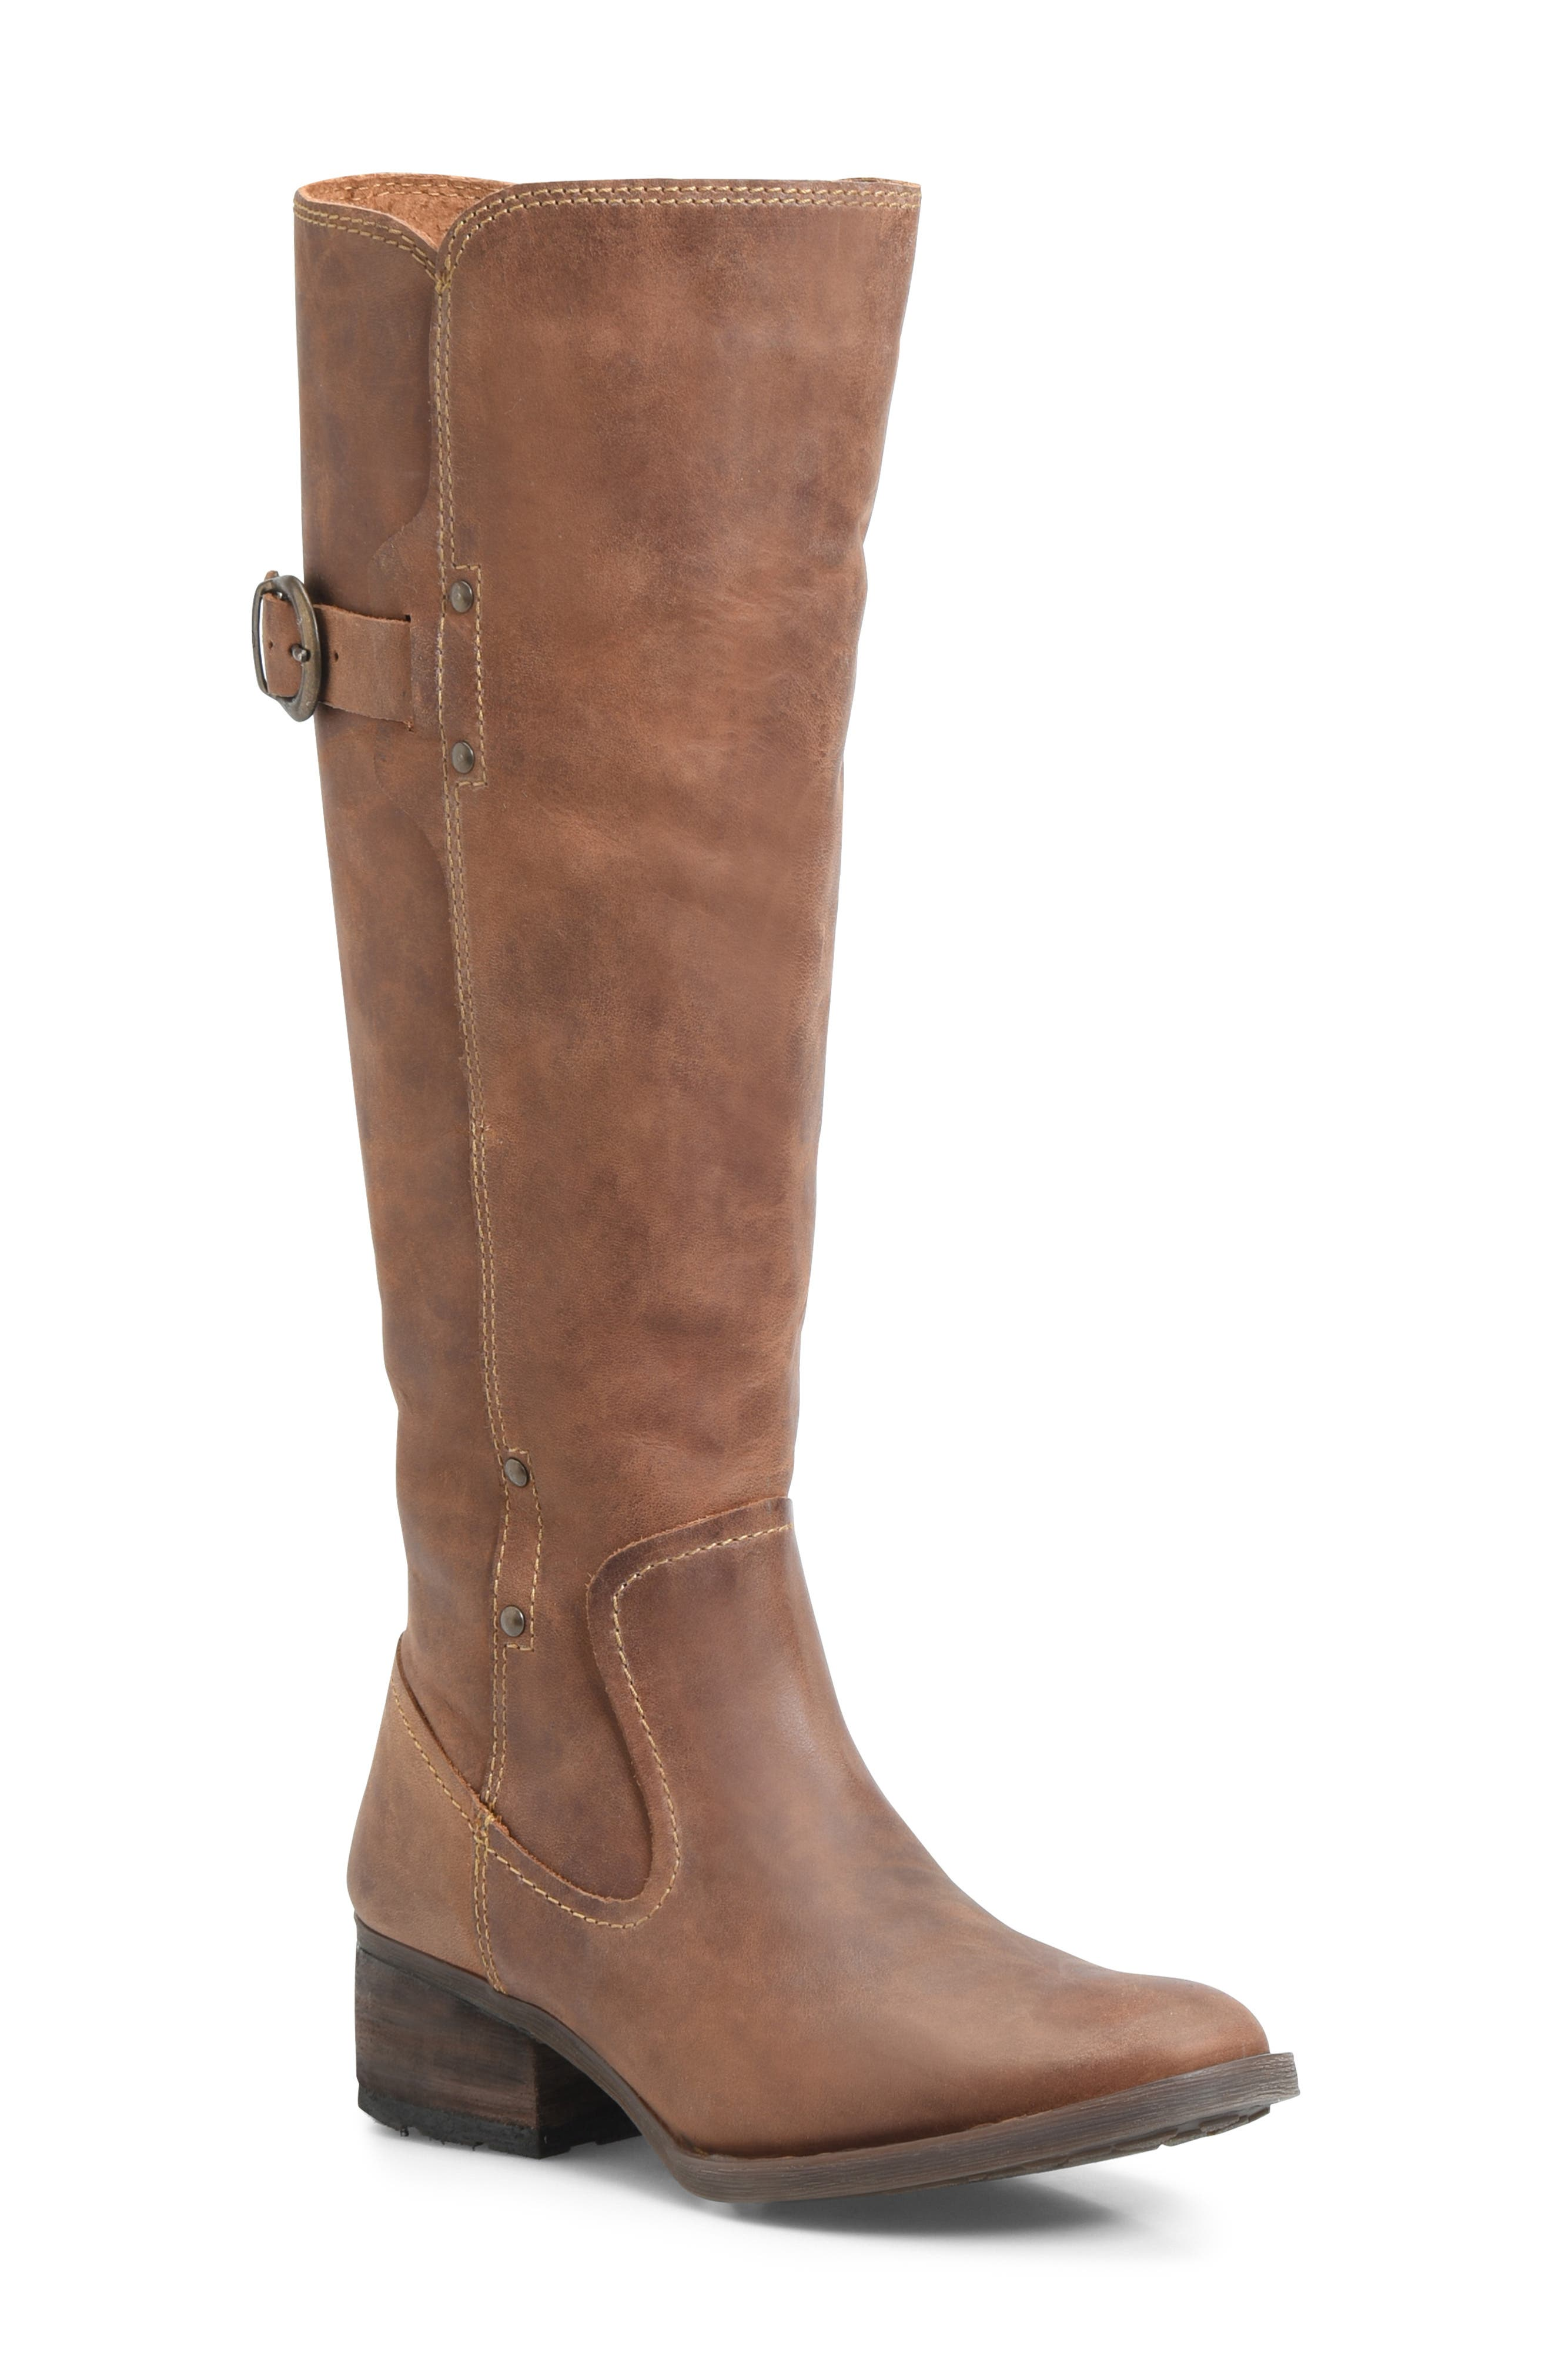 B?rn Mercado Knee High Boot, Brown